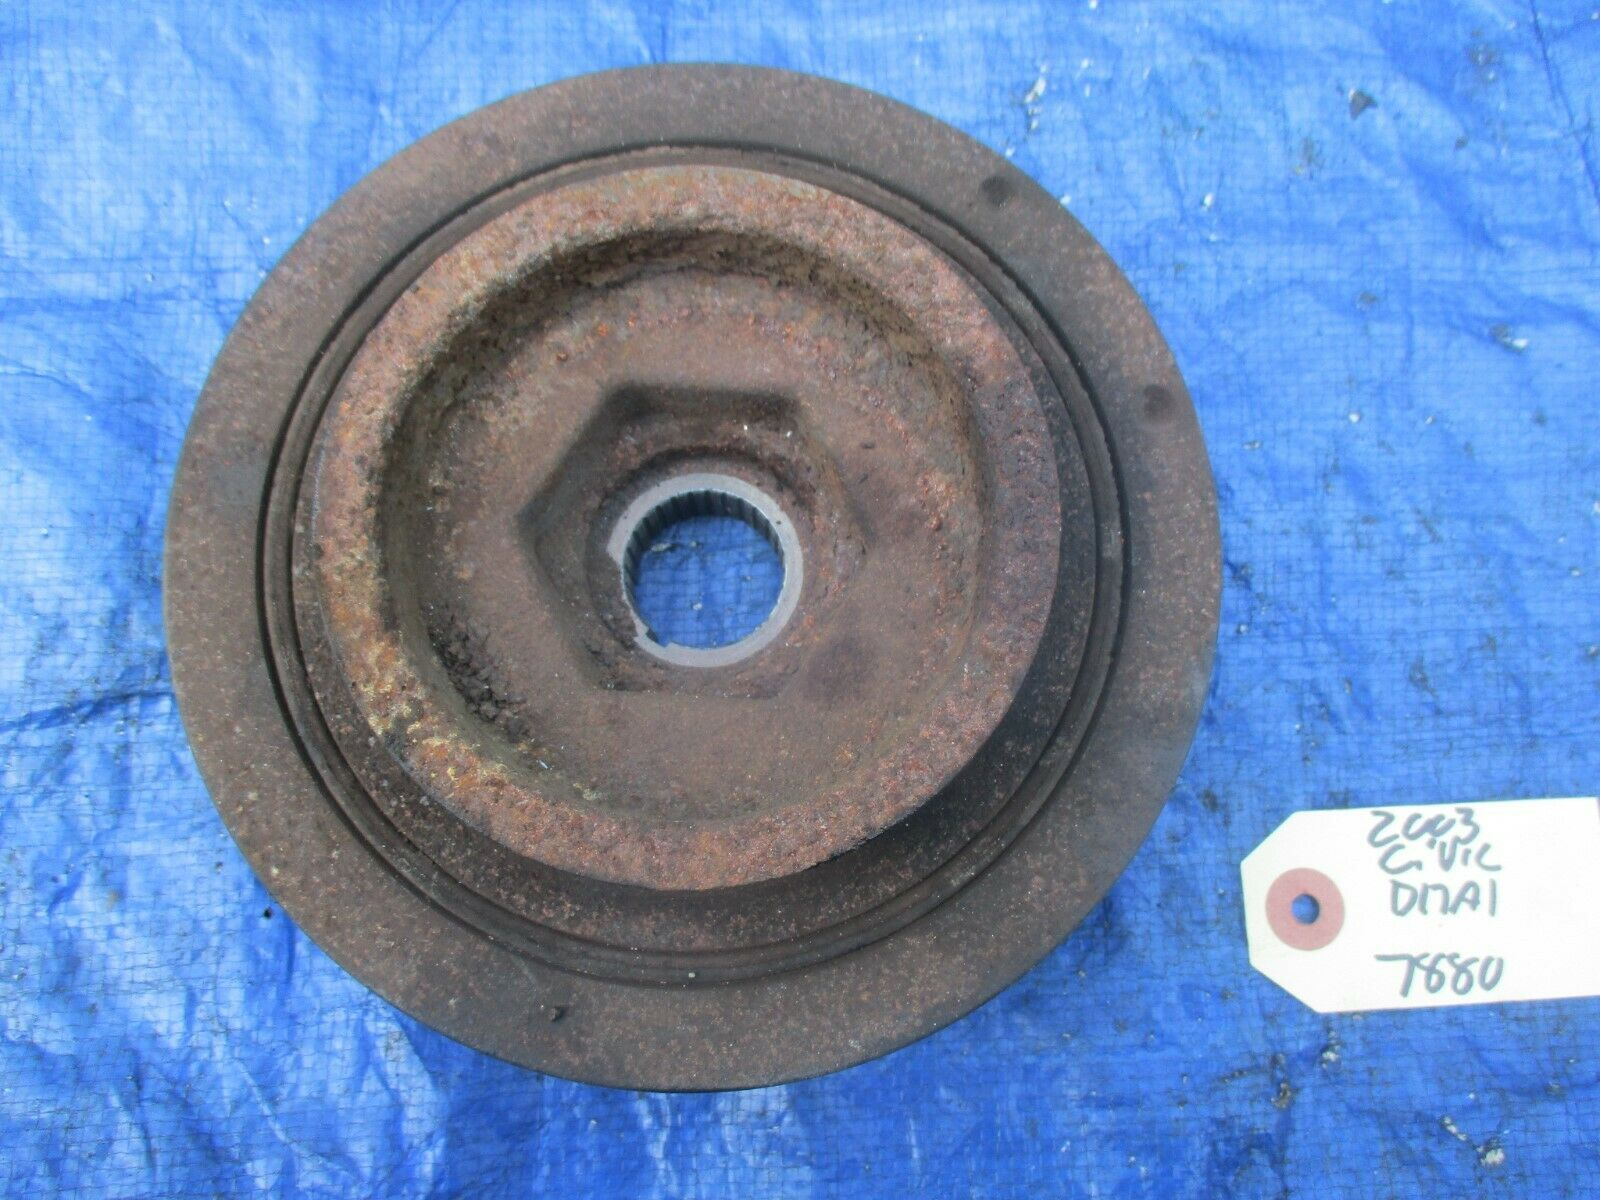 01-05 Honda Civic D17A1 harmonic balancer crank pulley engine motor OEM 1.7 D17